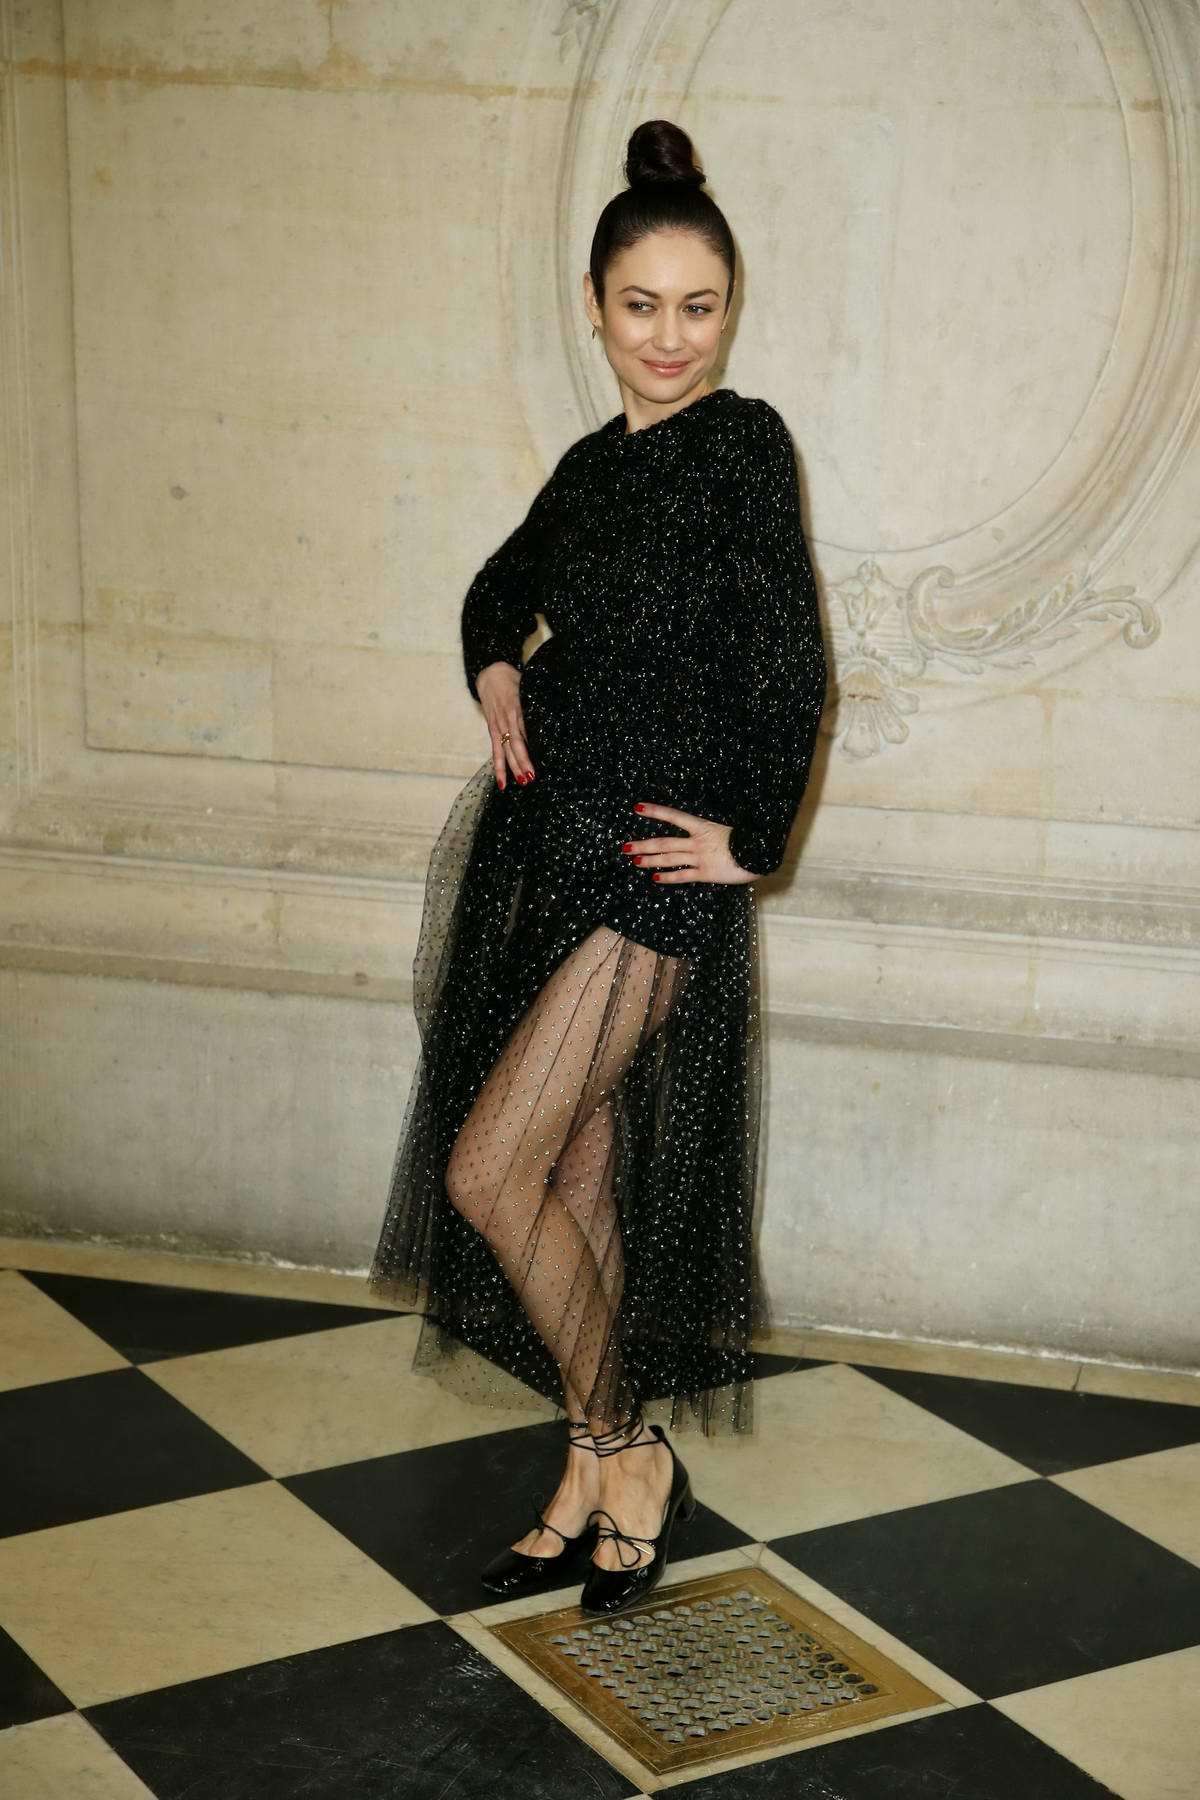 Olga Kurylenko attends Christian Dior Show, fall winter 2018-2019 during Paris Fashion Week, France